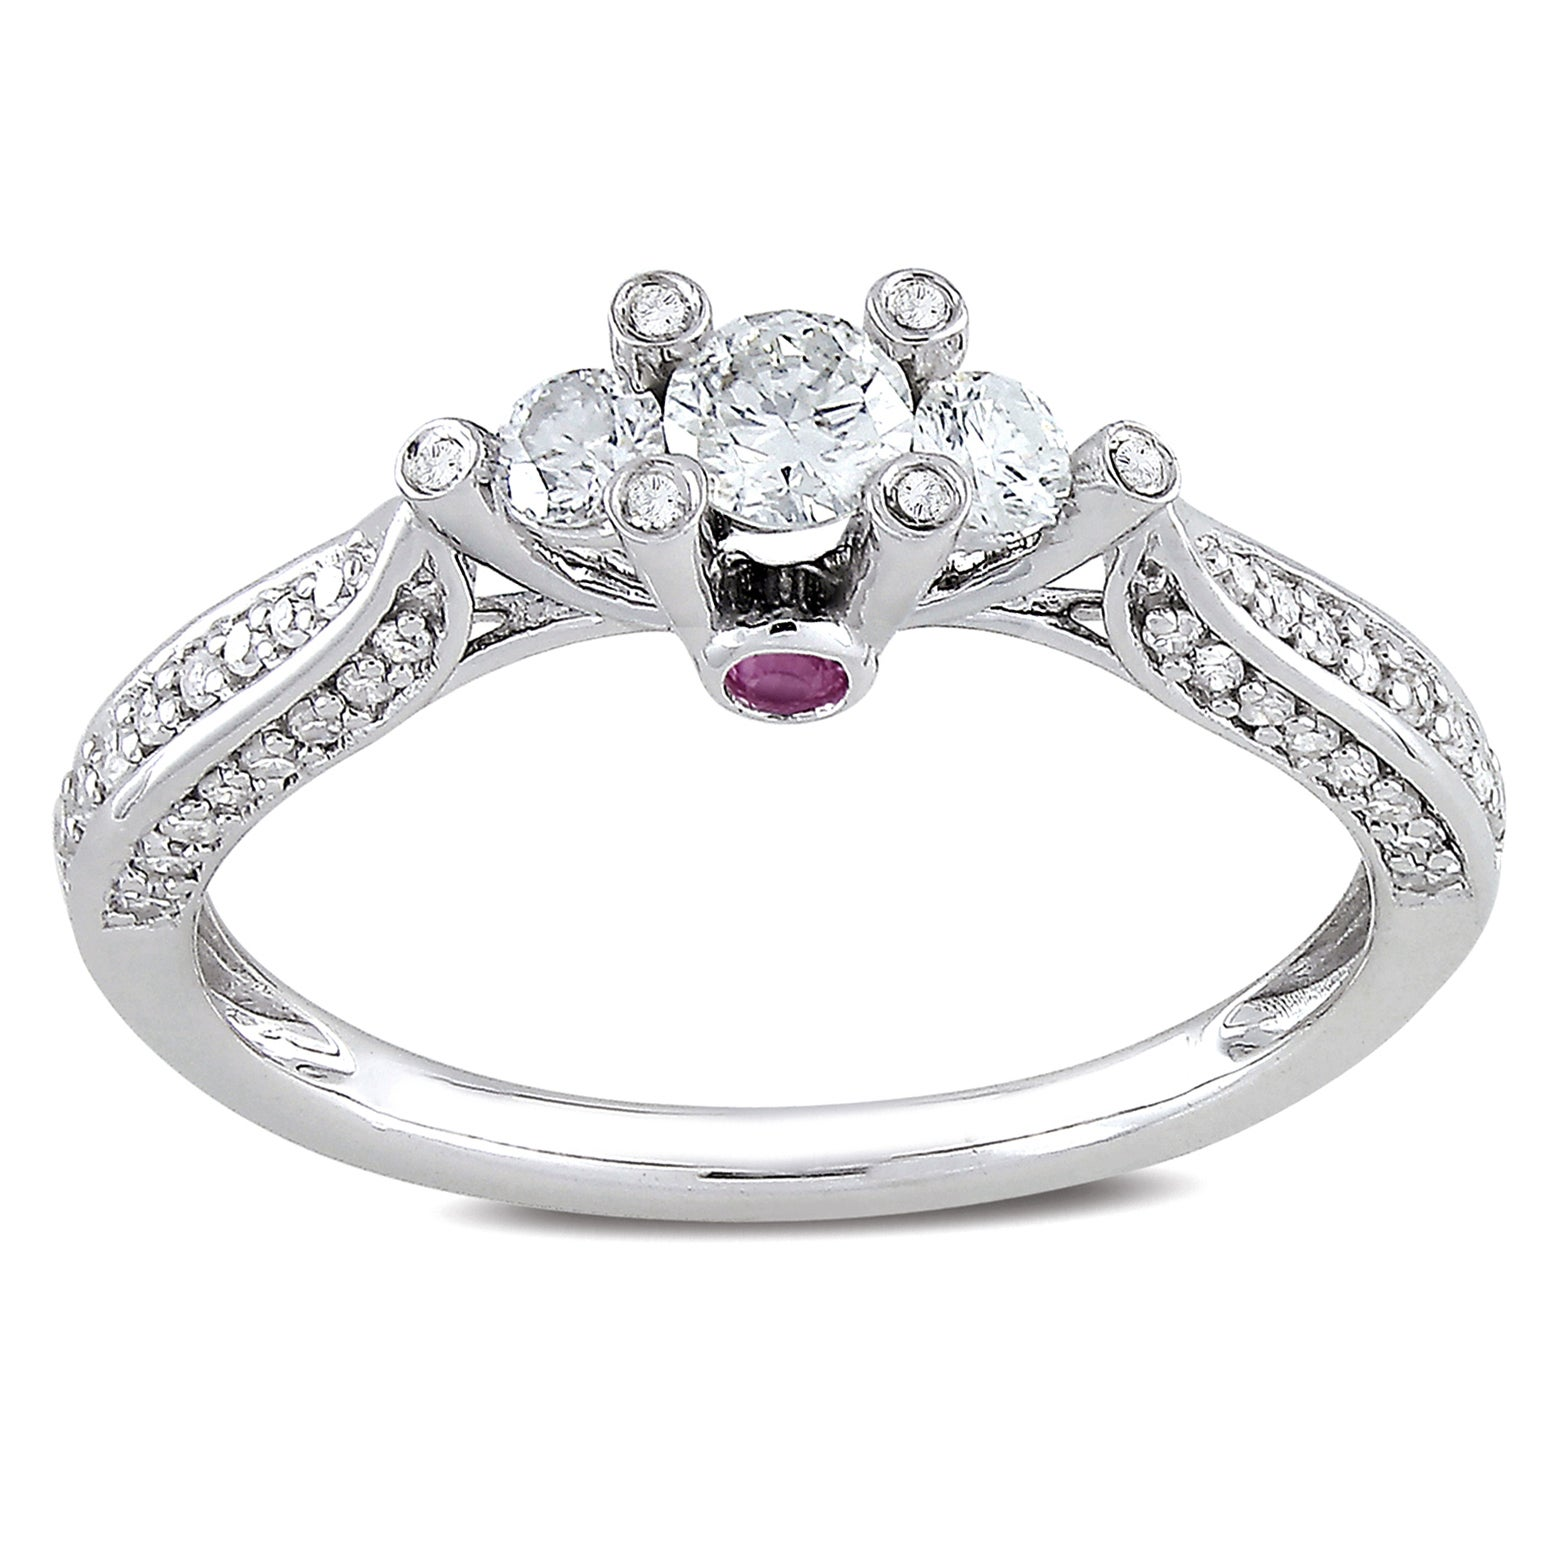 Miadora 14k White Gold 1/2ct TDW Diamond and Pink Sapphire Ring (H-I, I2-I3)